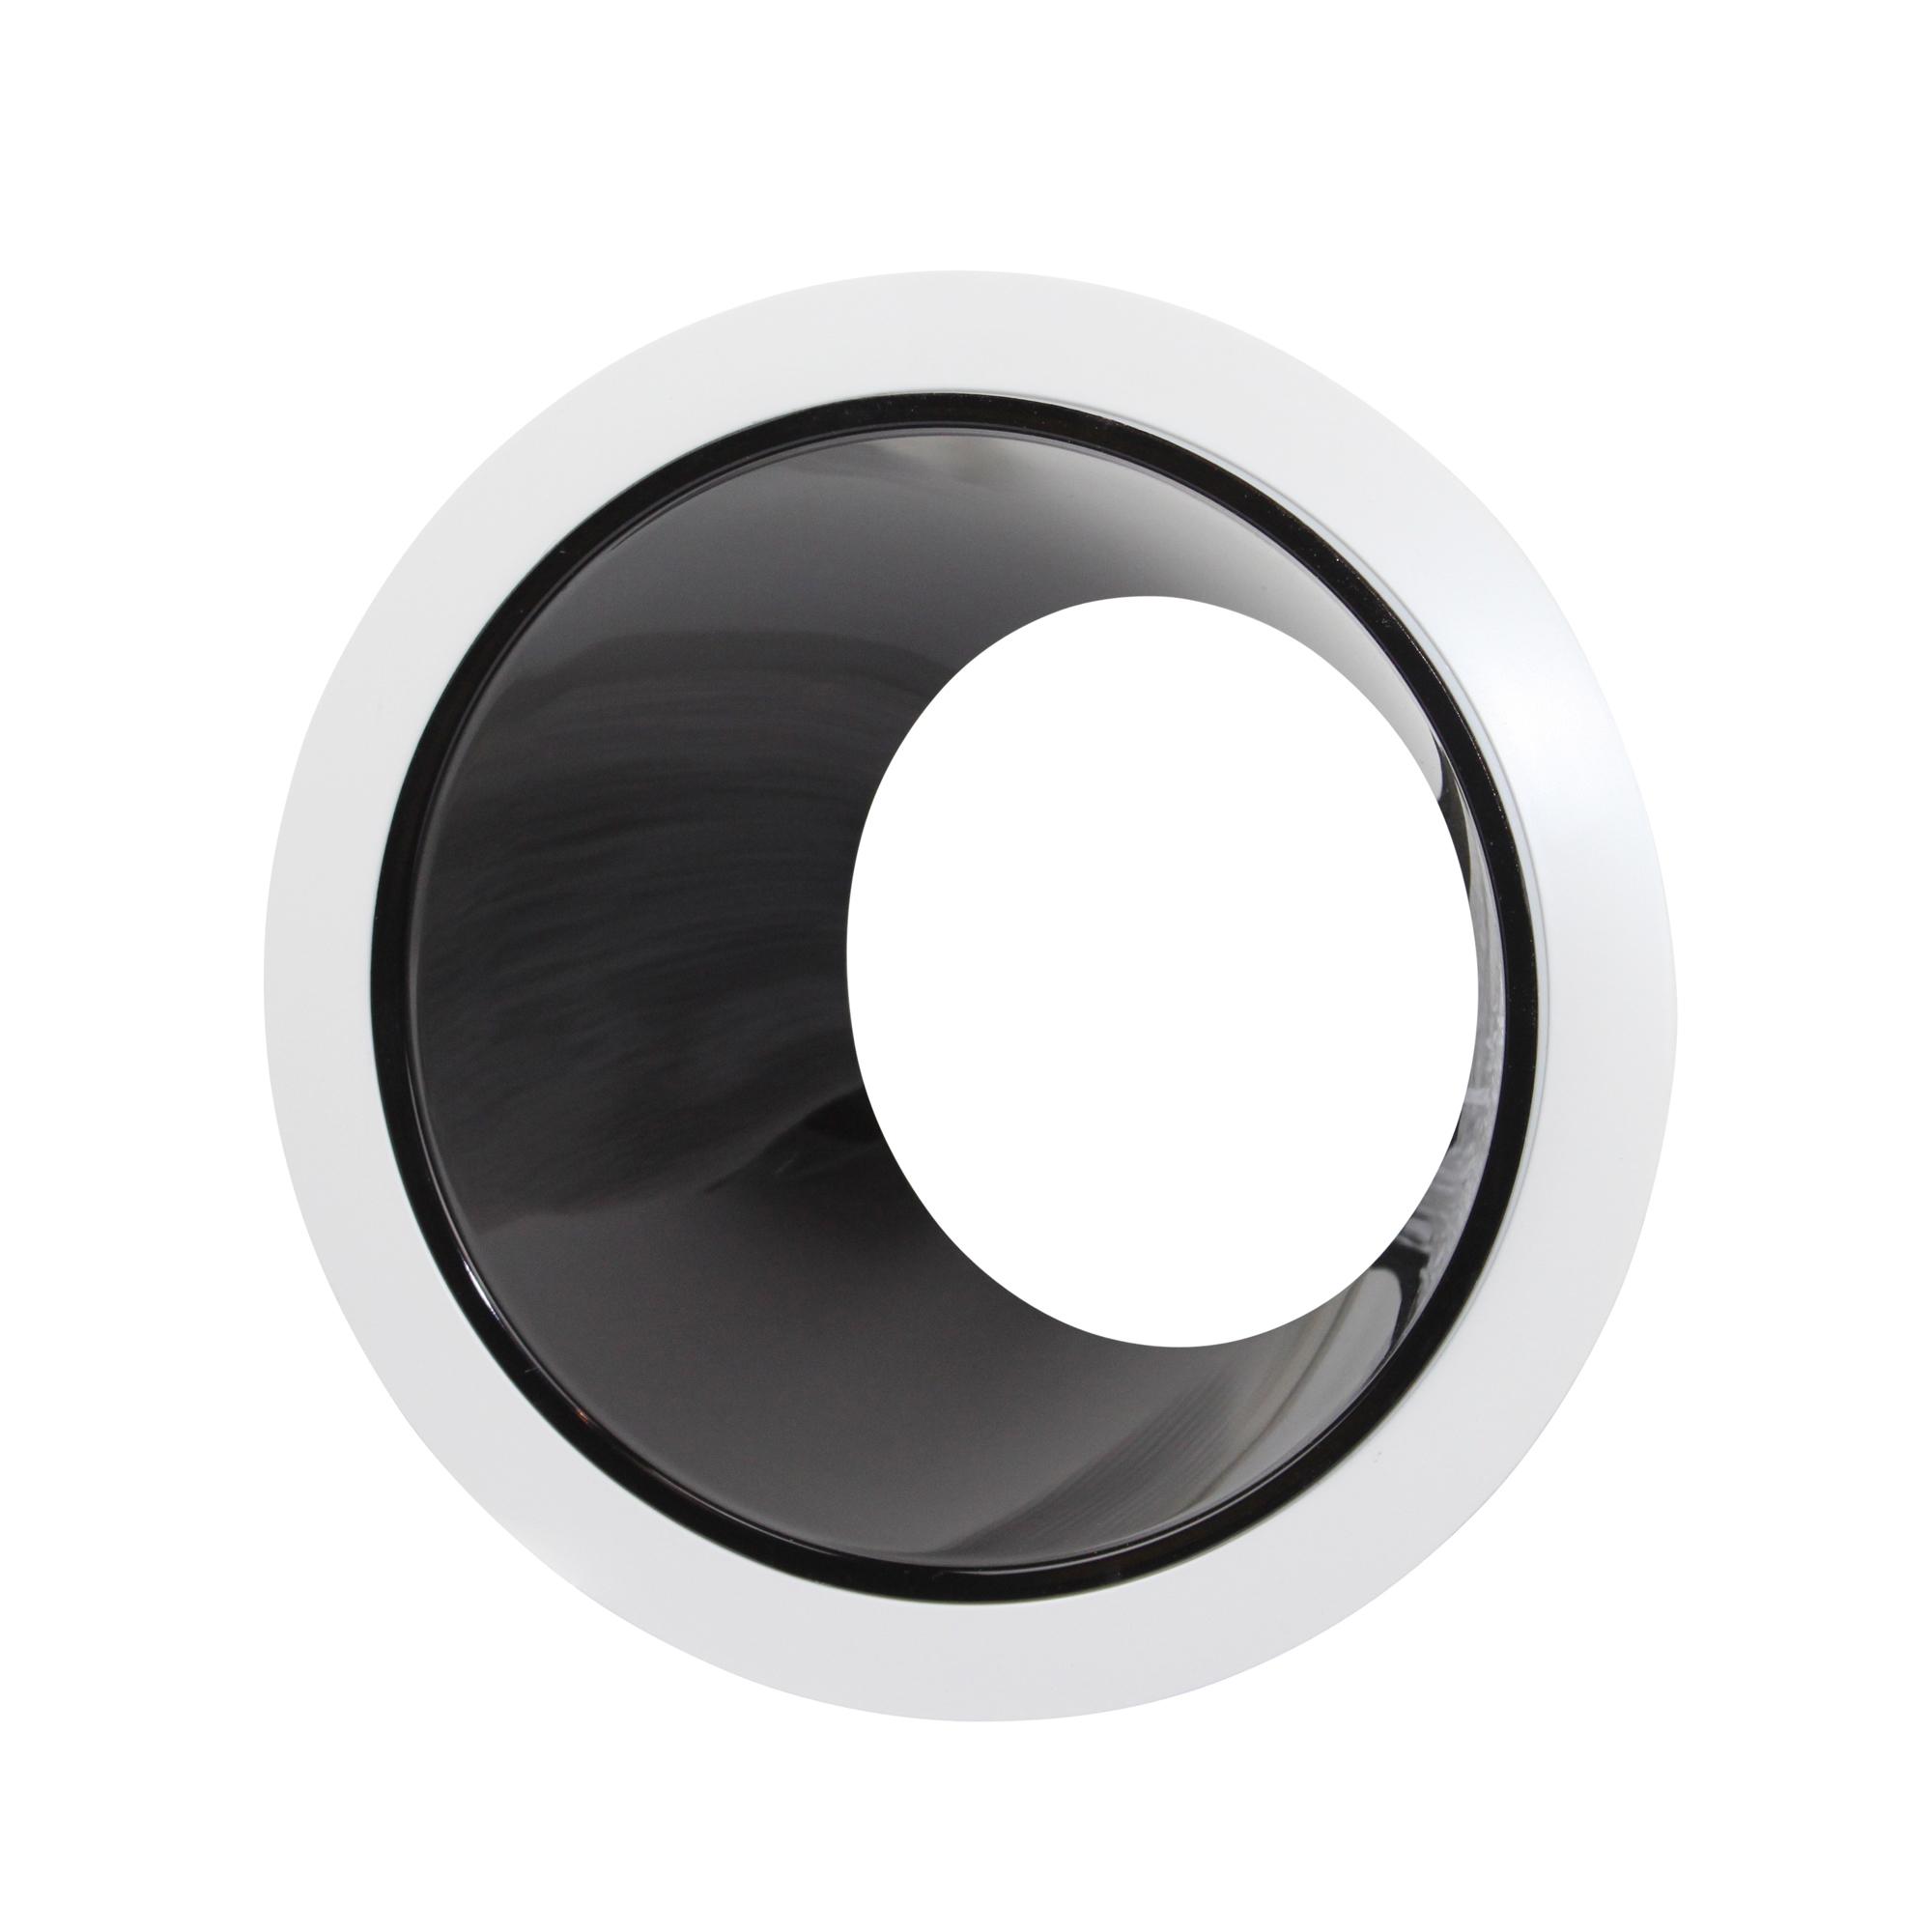 Cooper portfolio 6470b hid 6 reflector black specular for Number of recessed lights per room